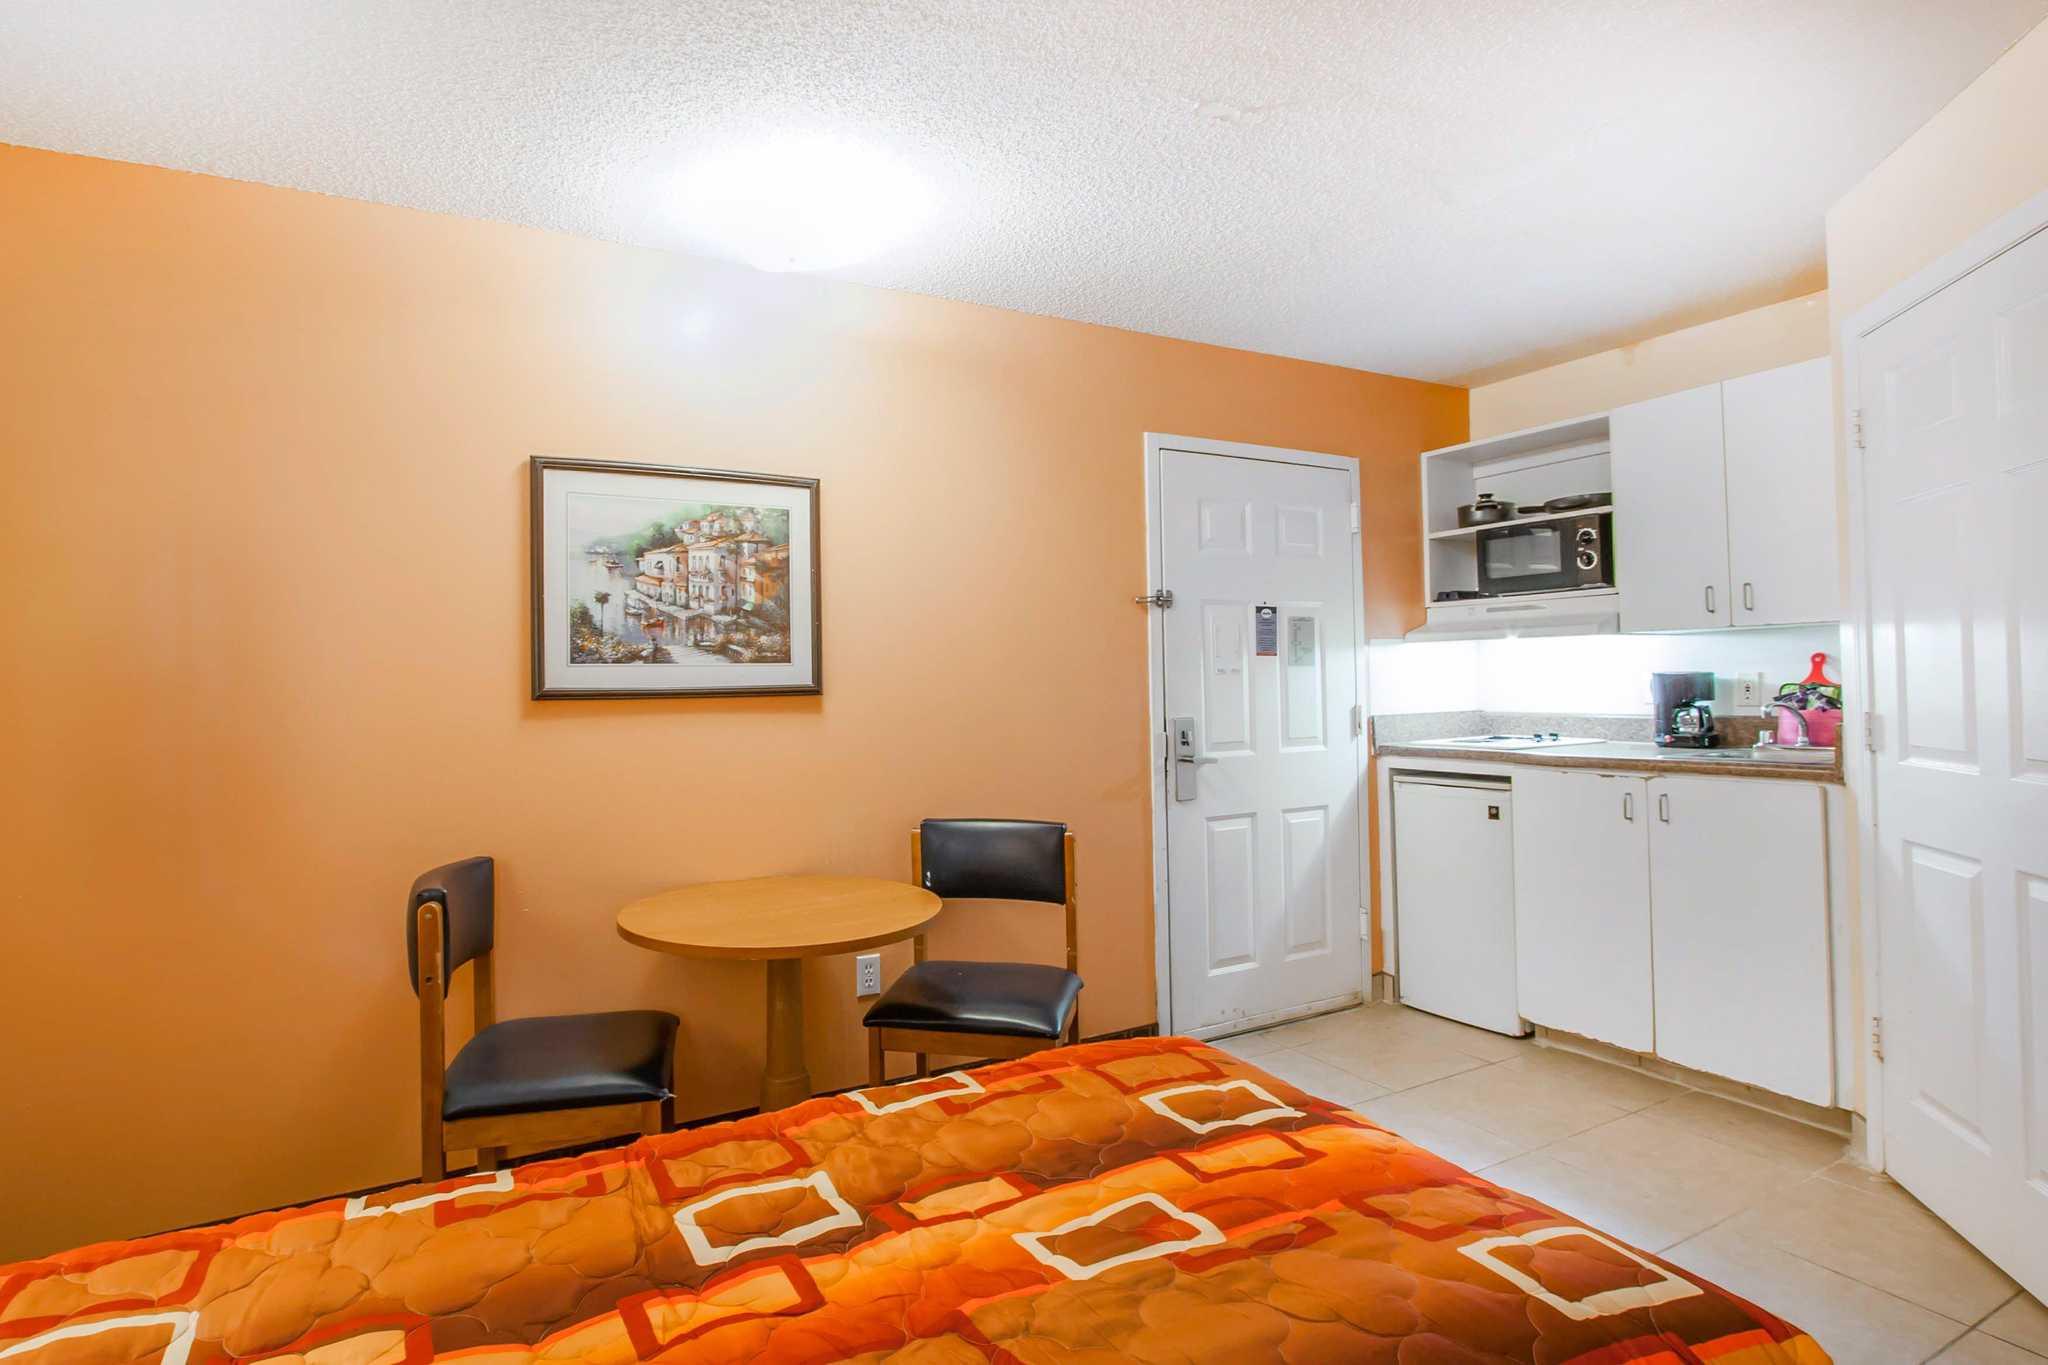 Suburban Extended Stay Hotel Bartlett Tennessee Tn Localdatabase Com